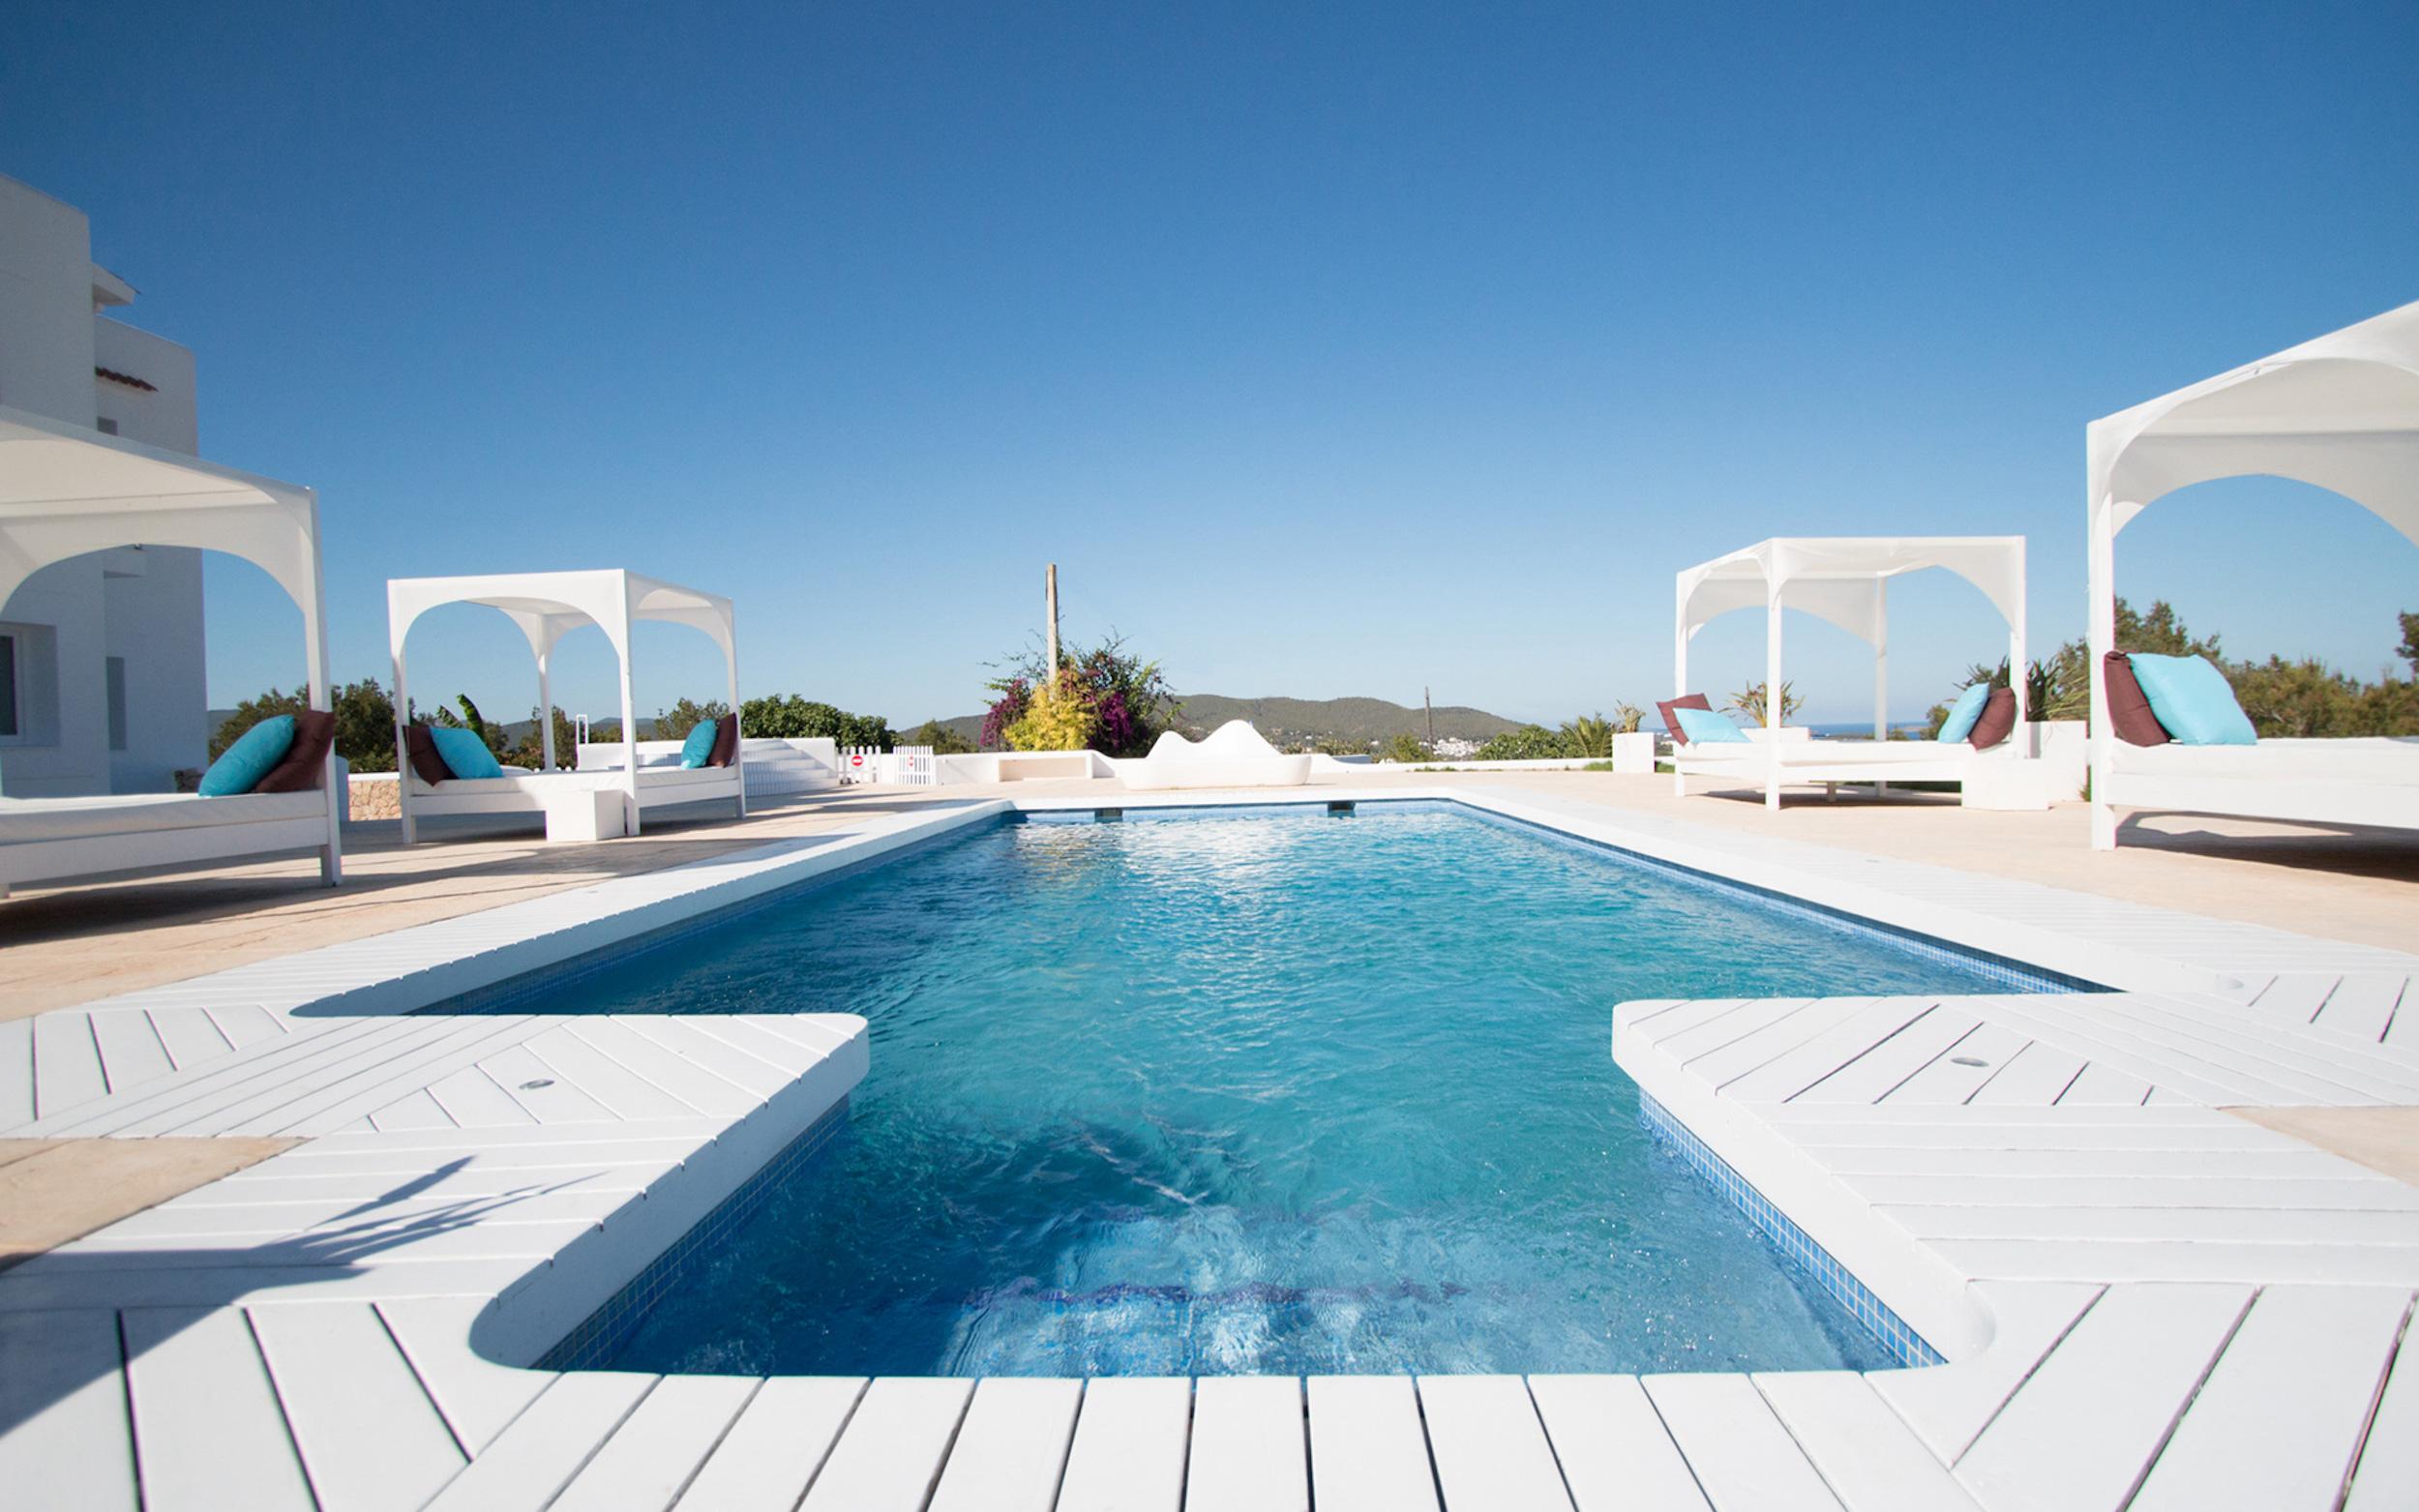 - Villa Inessa - Image 1/31